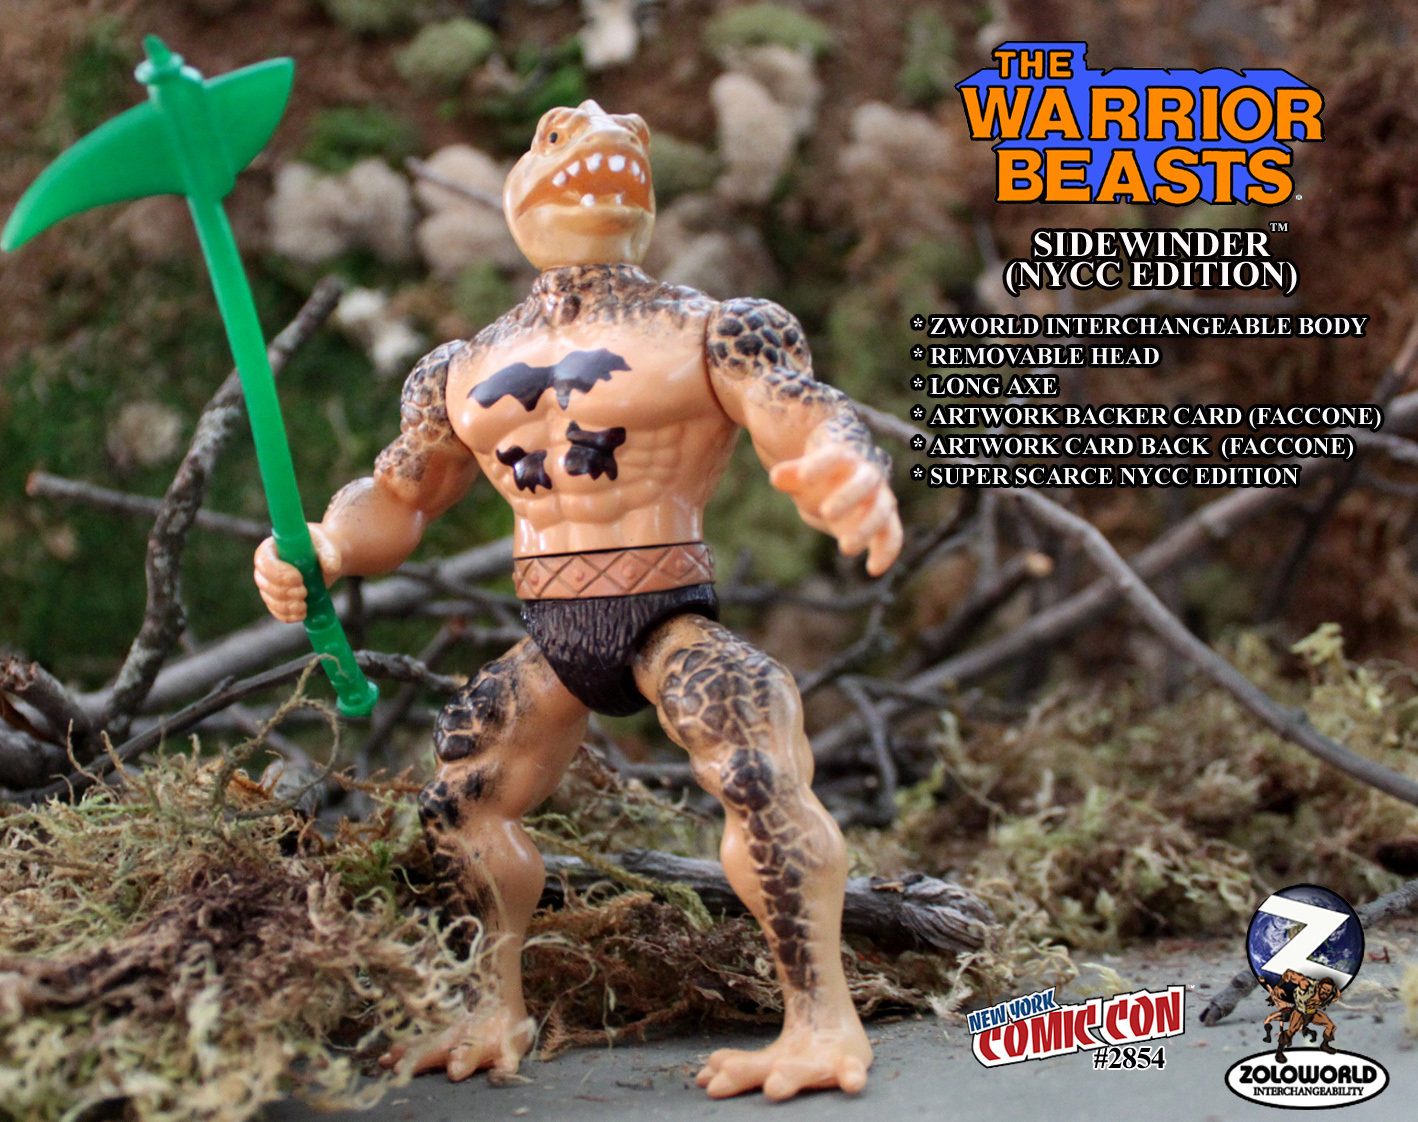 The Warrior Beasts: SIDEWINDER by Zoloworld